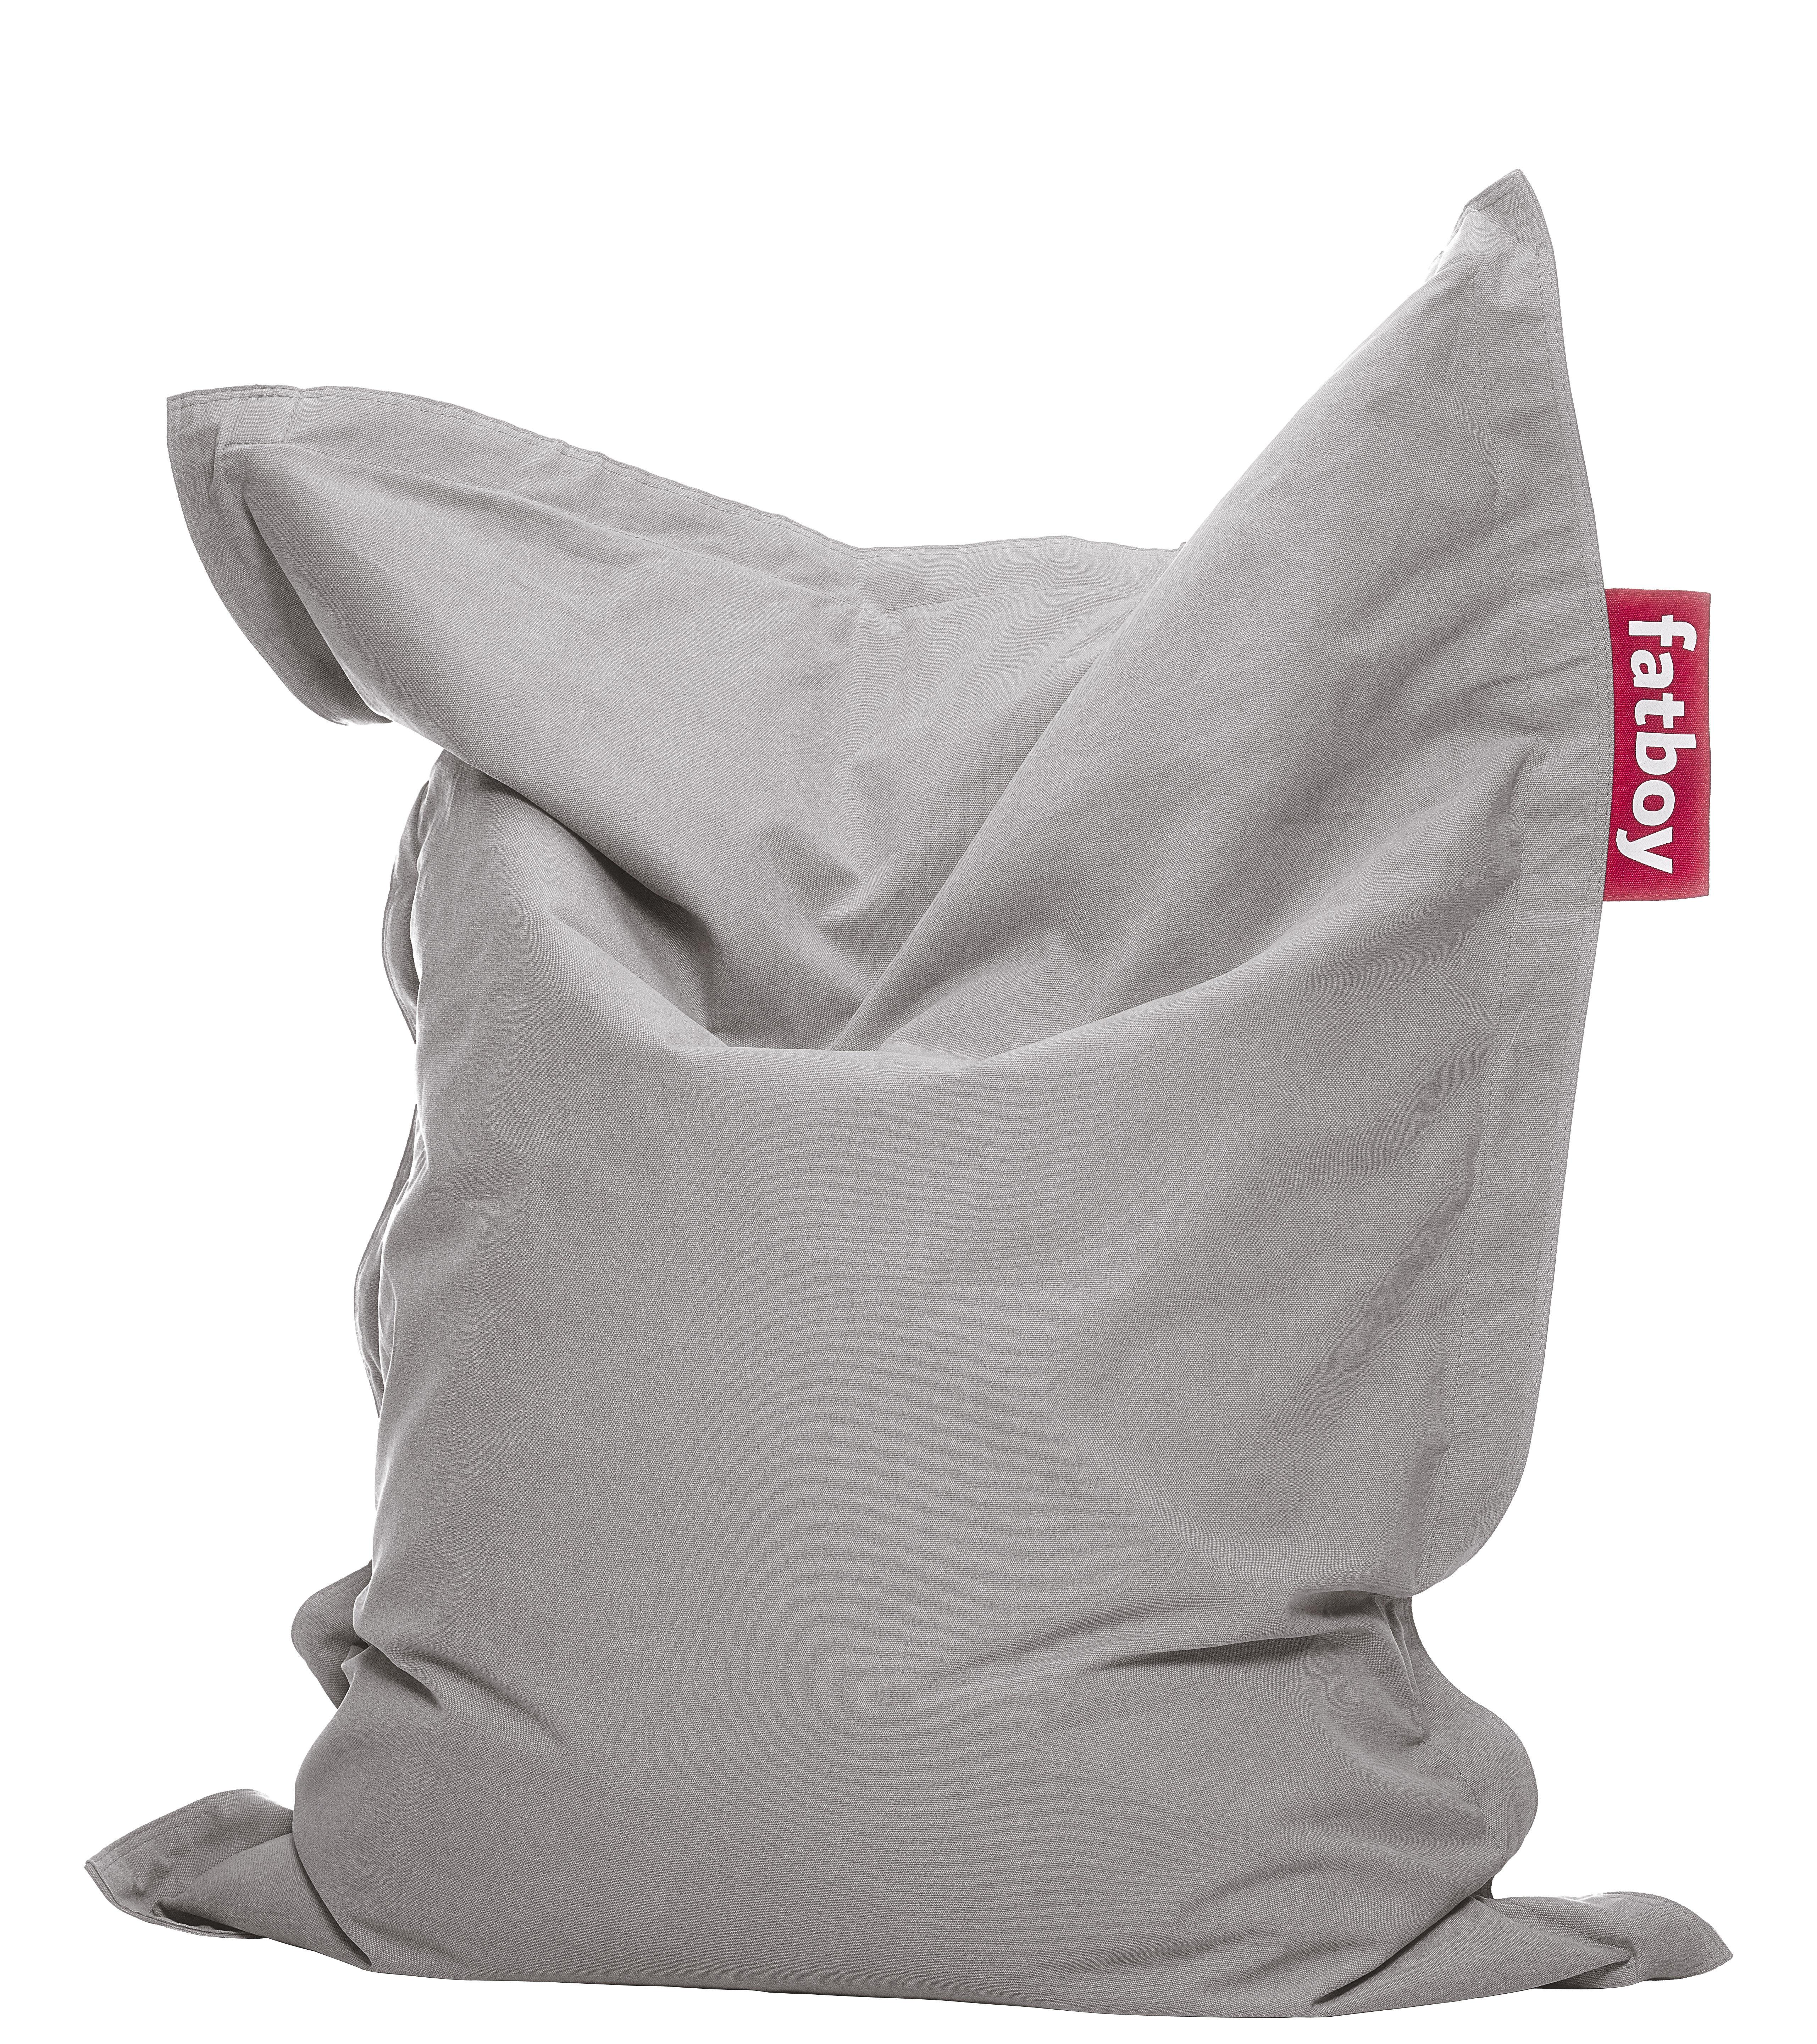 pouf junior stonewashed pour enfant argent fatboy. Black Bedroom Furniture Sets. Home Design Ideas